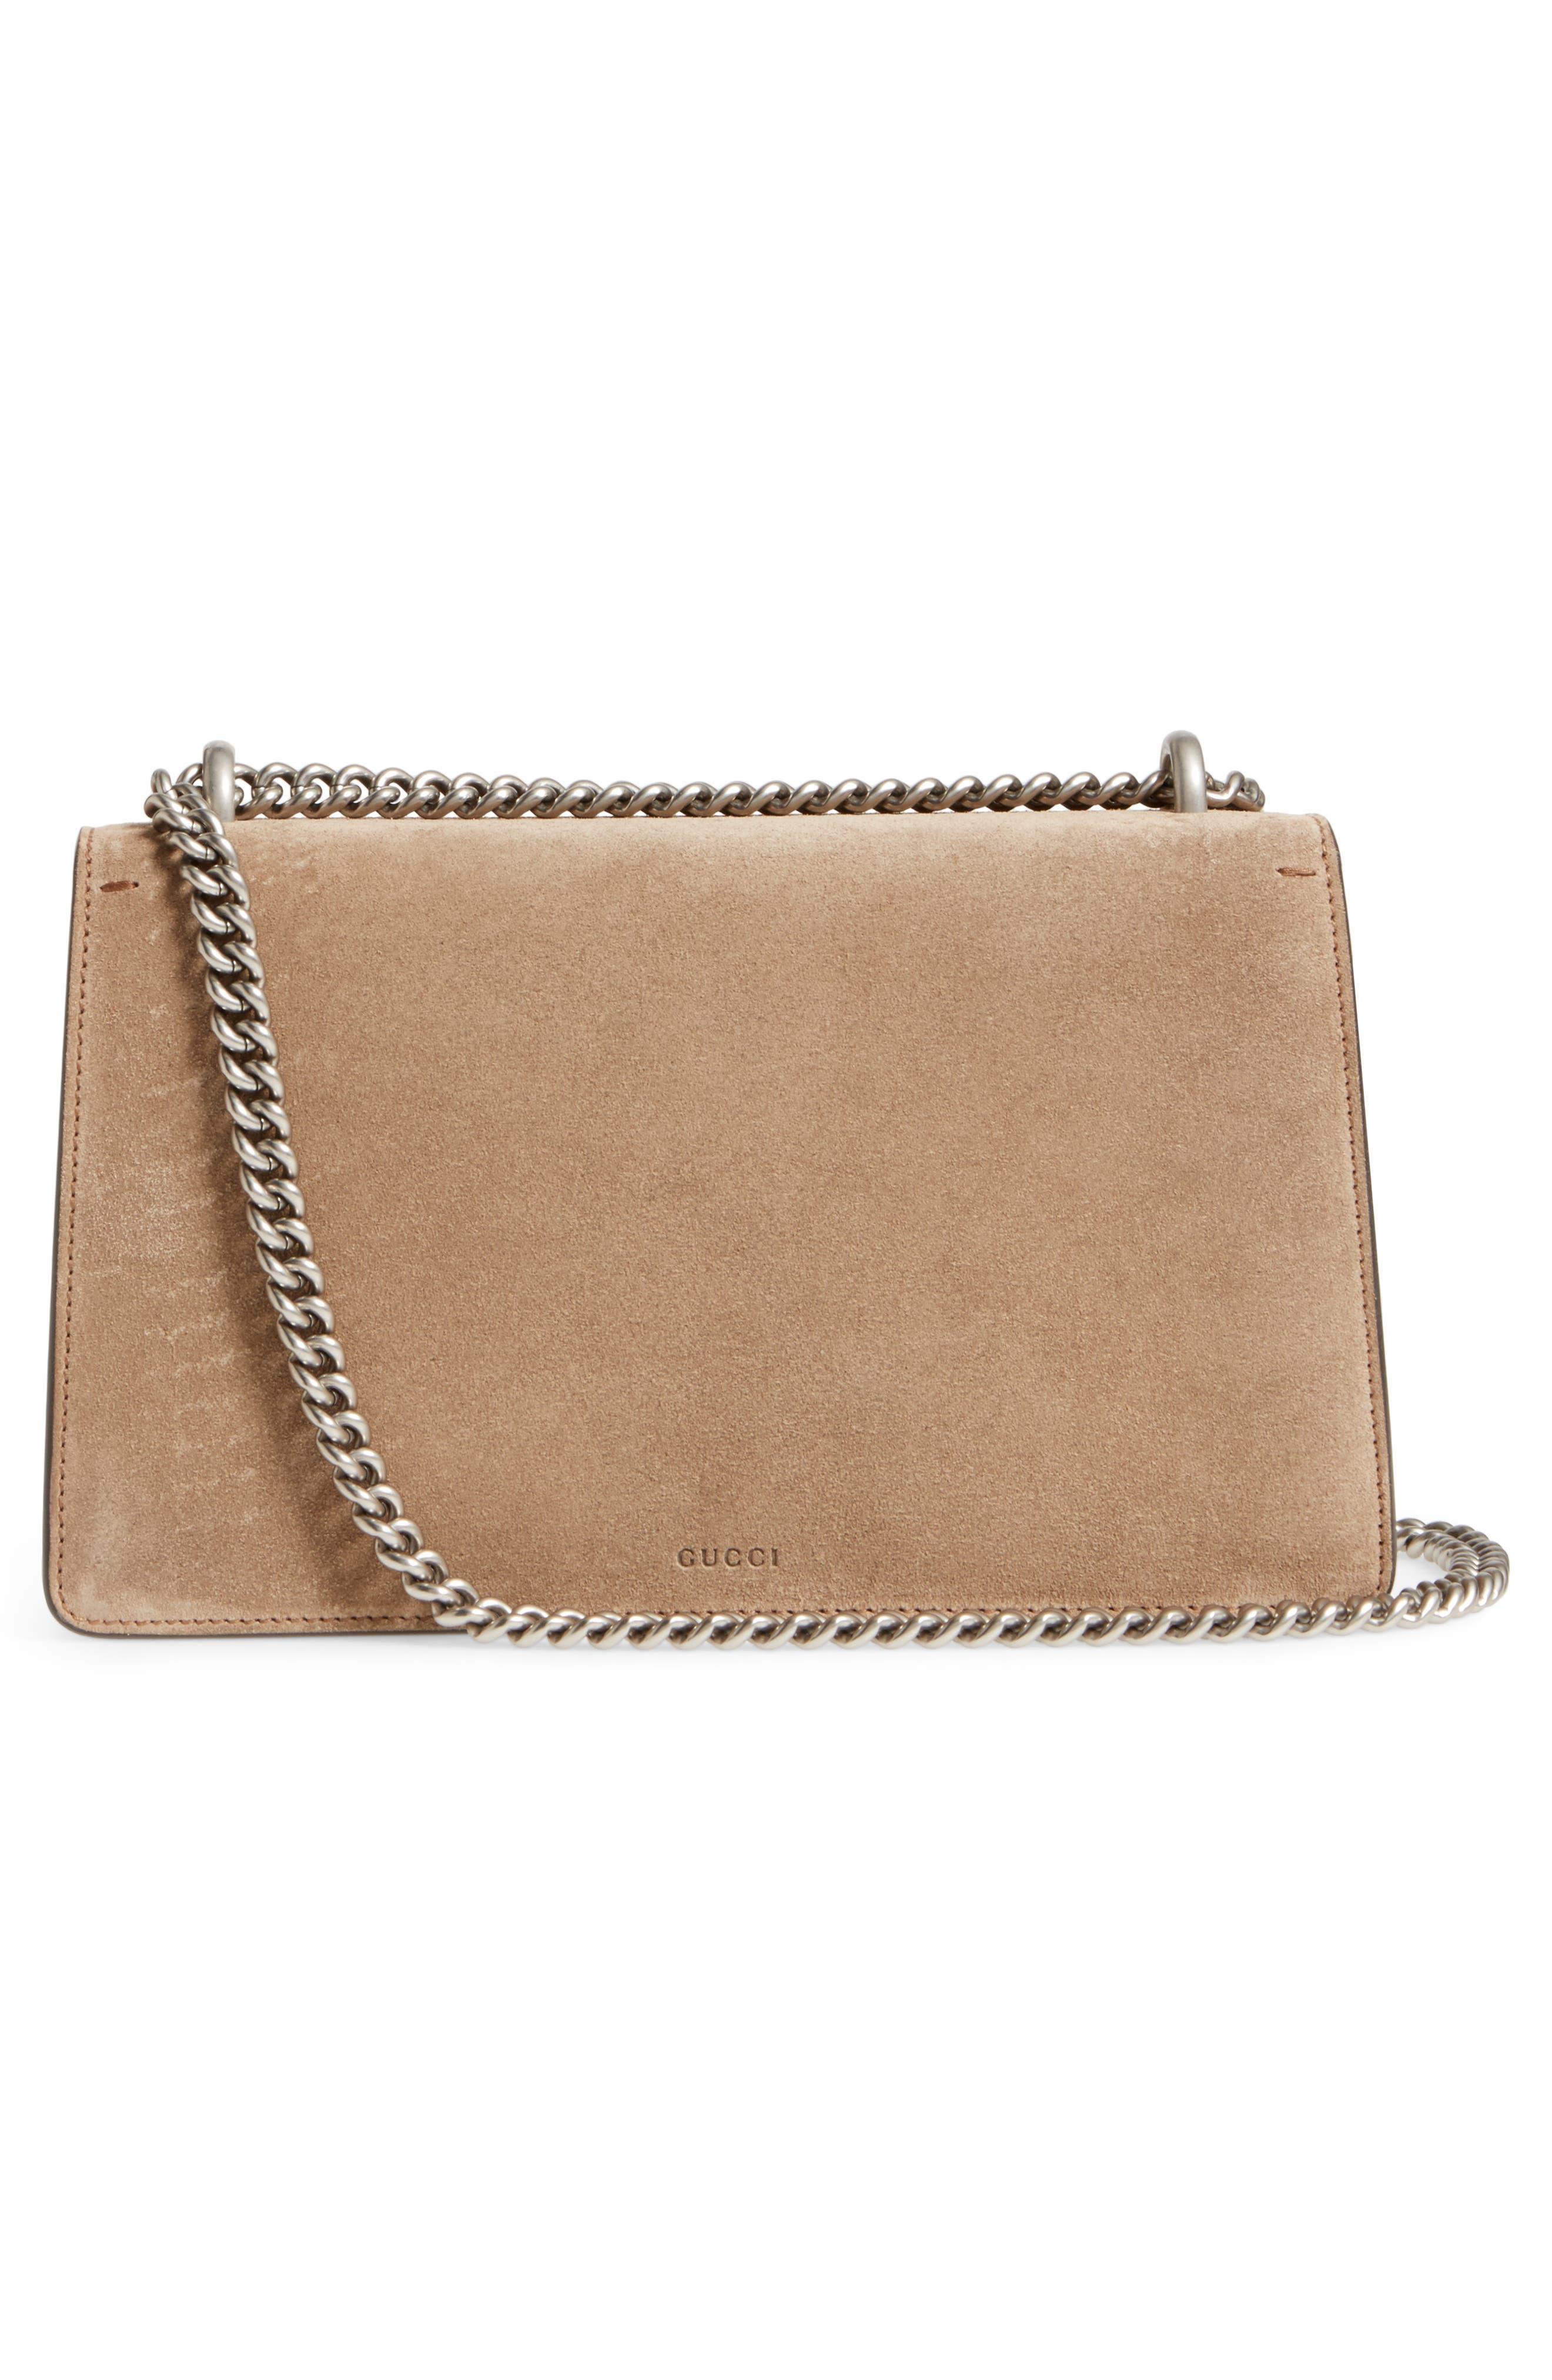 Alternate Image 3  - Gucci Small Dionysus Suede Shoulder Bag